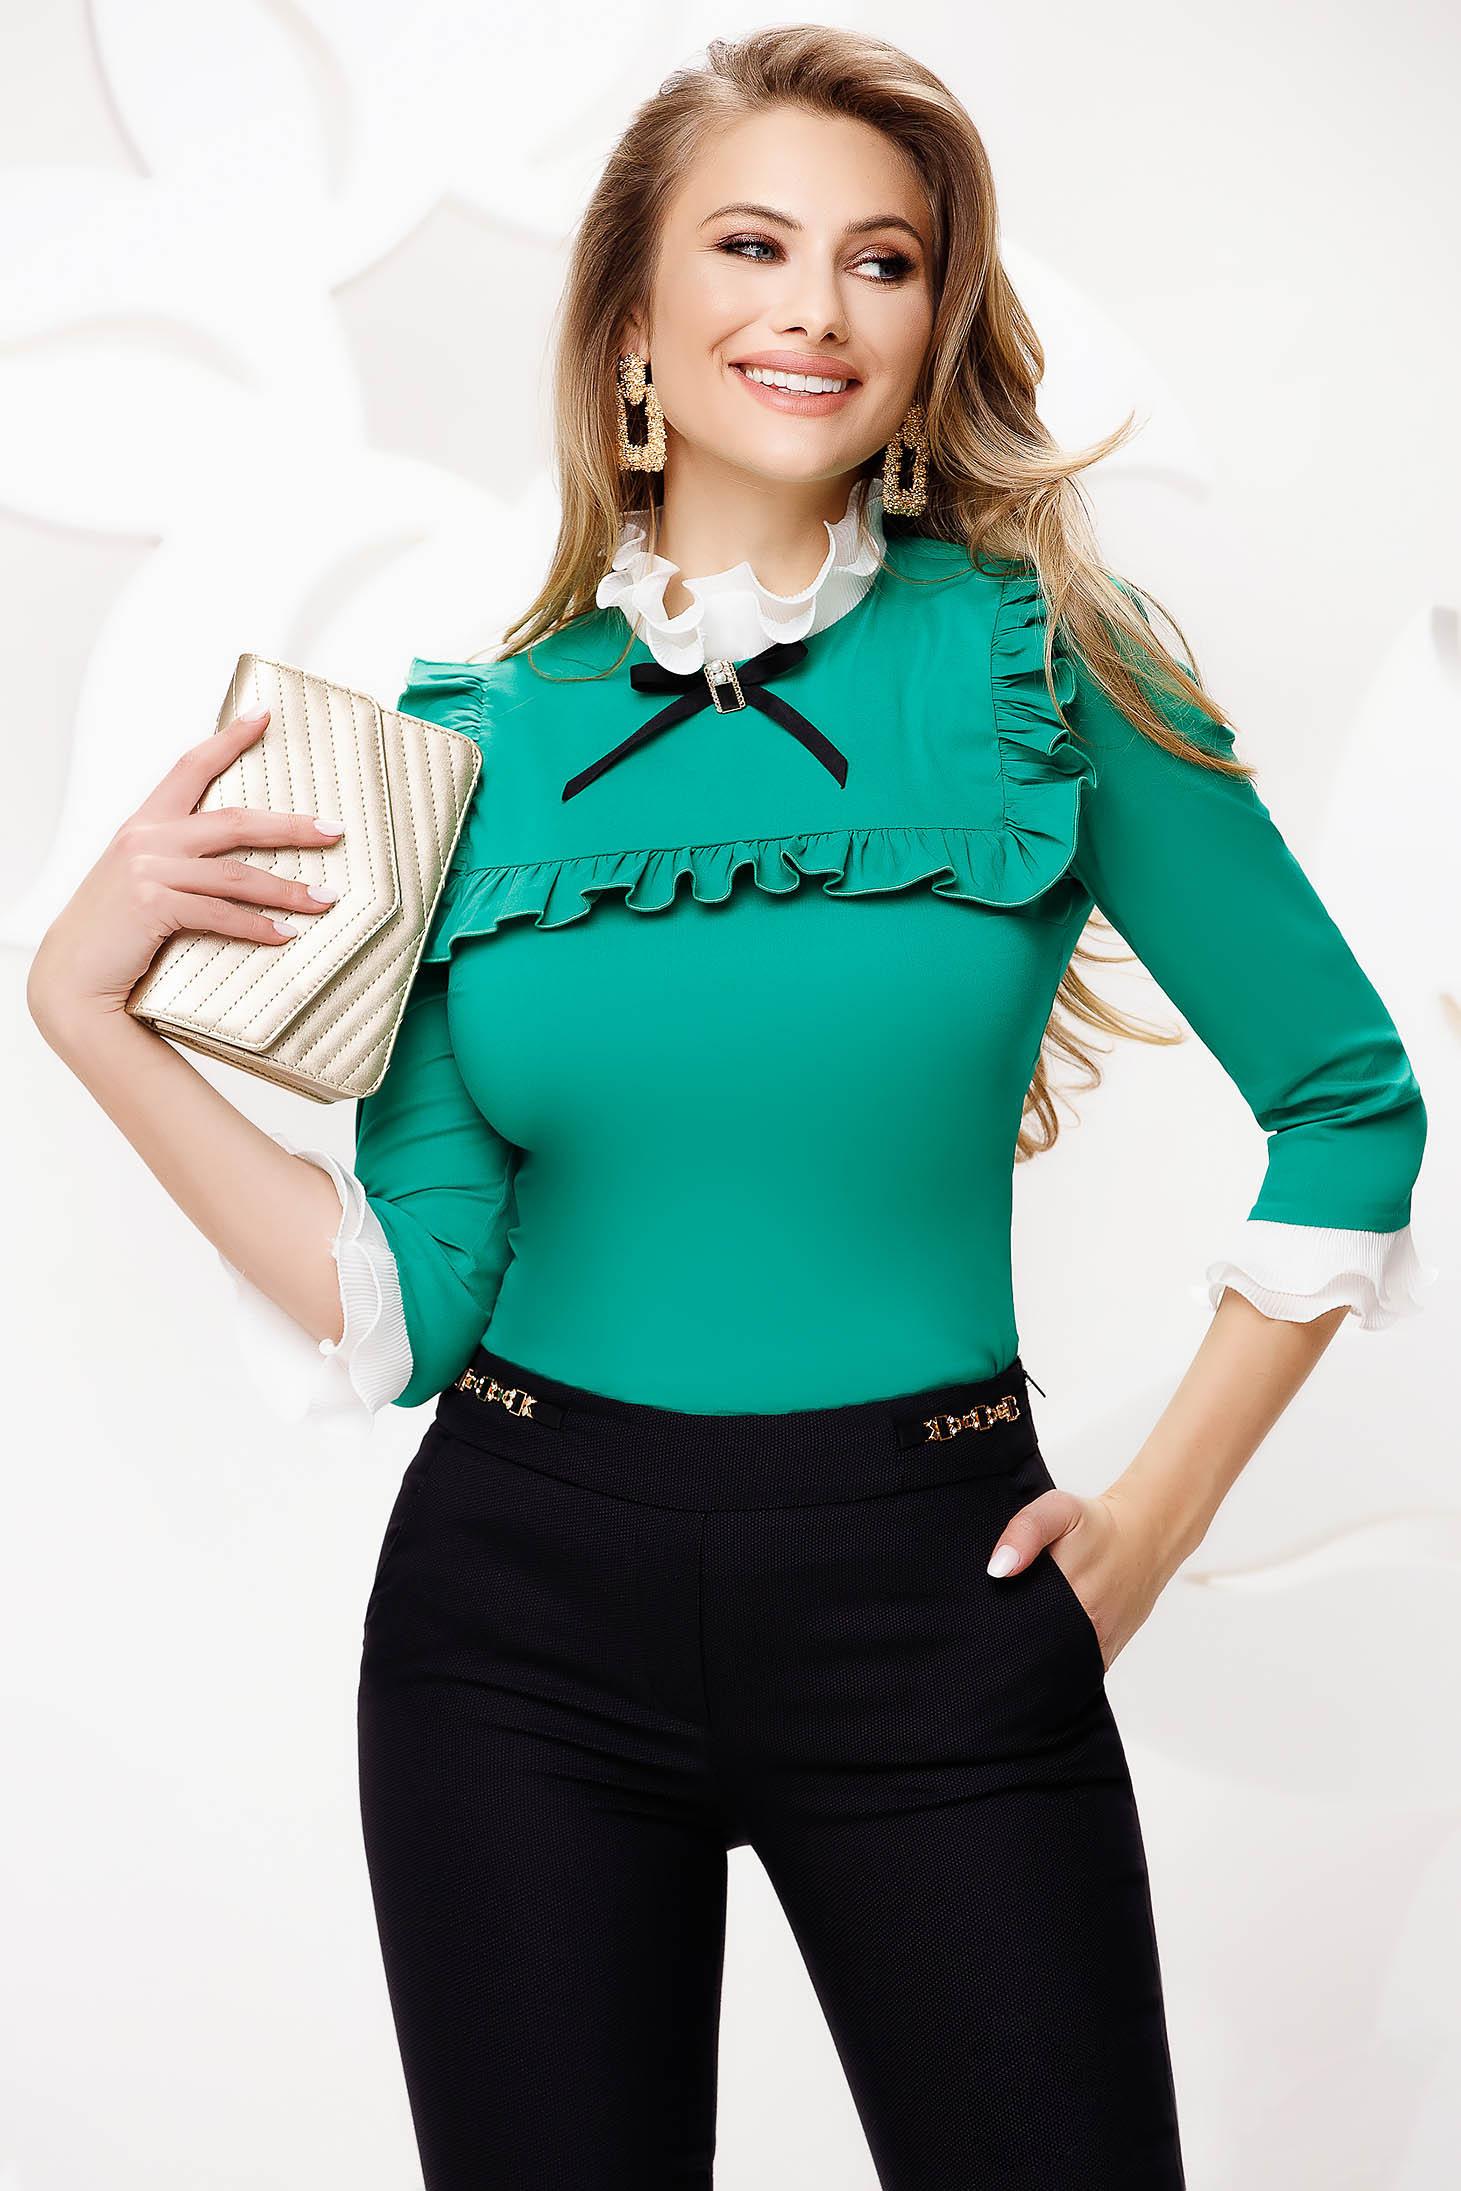 Camasa dama Fofy verde office cambrata din material usor elastic accesorizata cu fundite si volanase